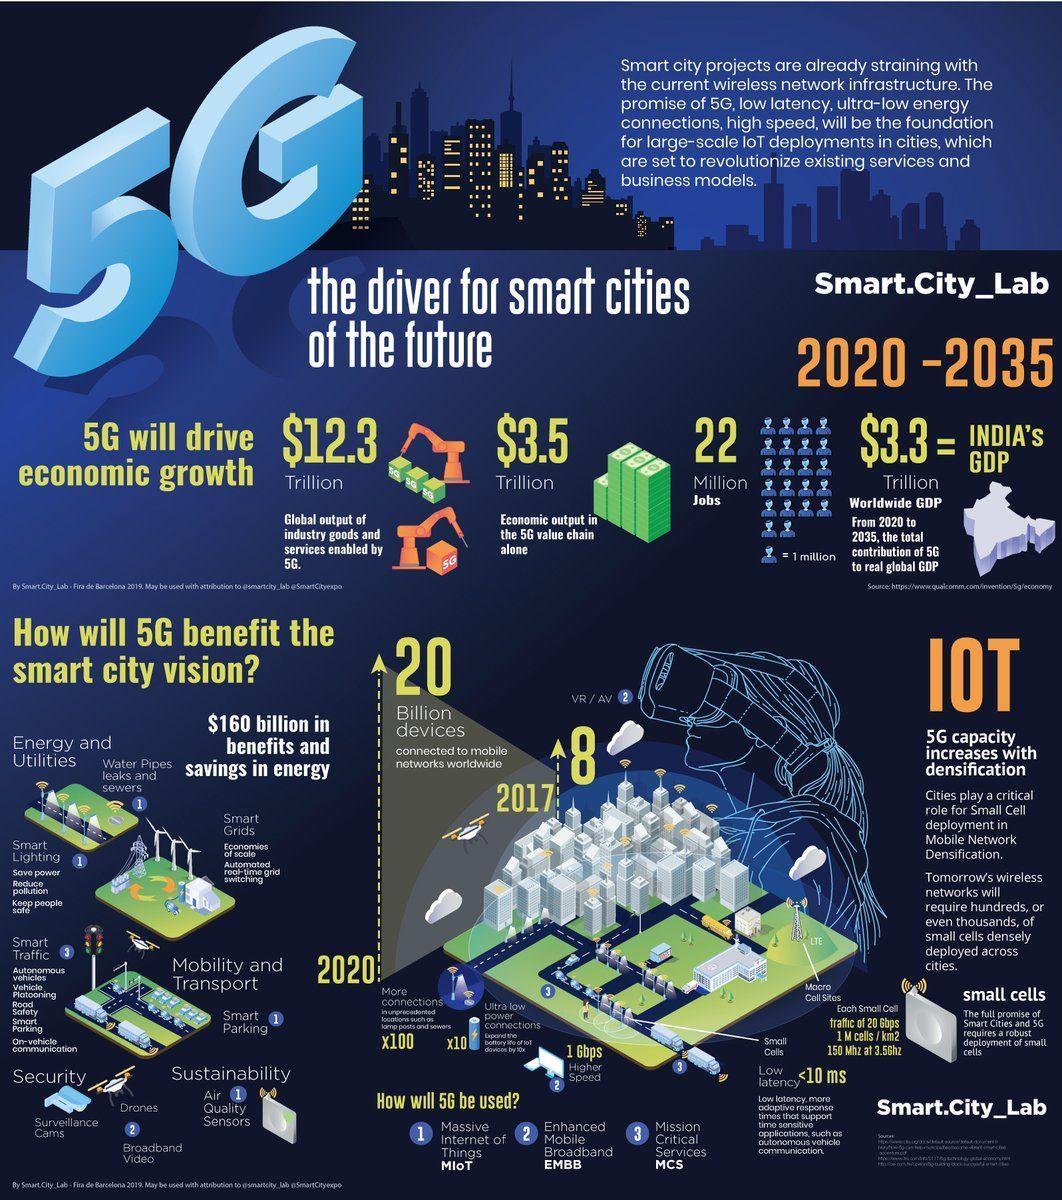 Minimalismtw Smart City Wireless Networking Network Infrastructure